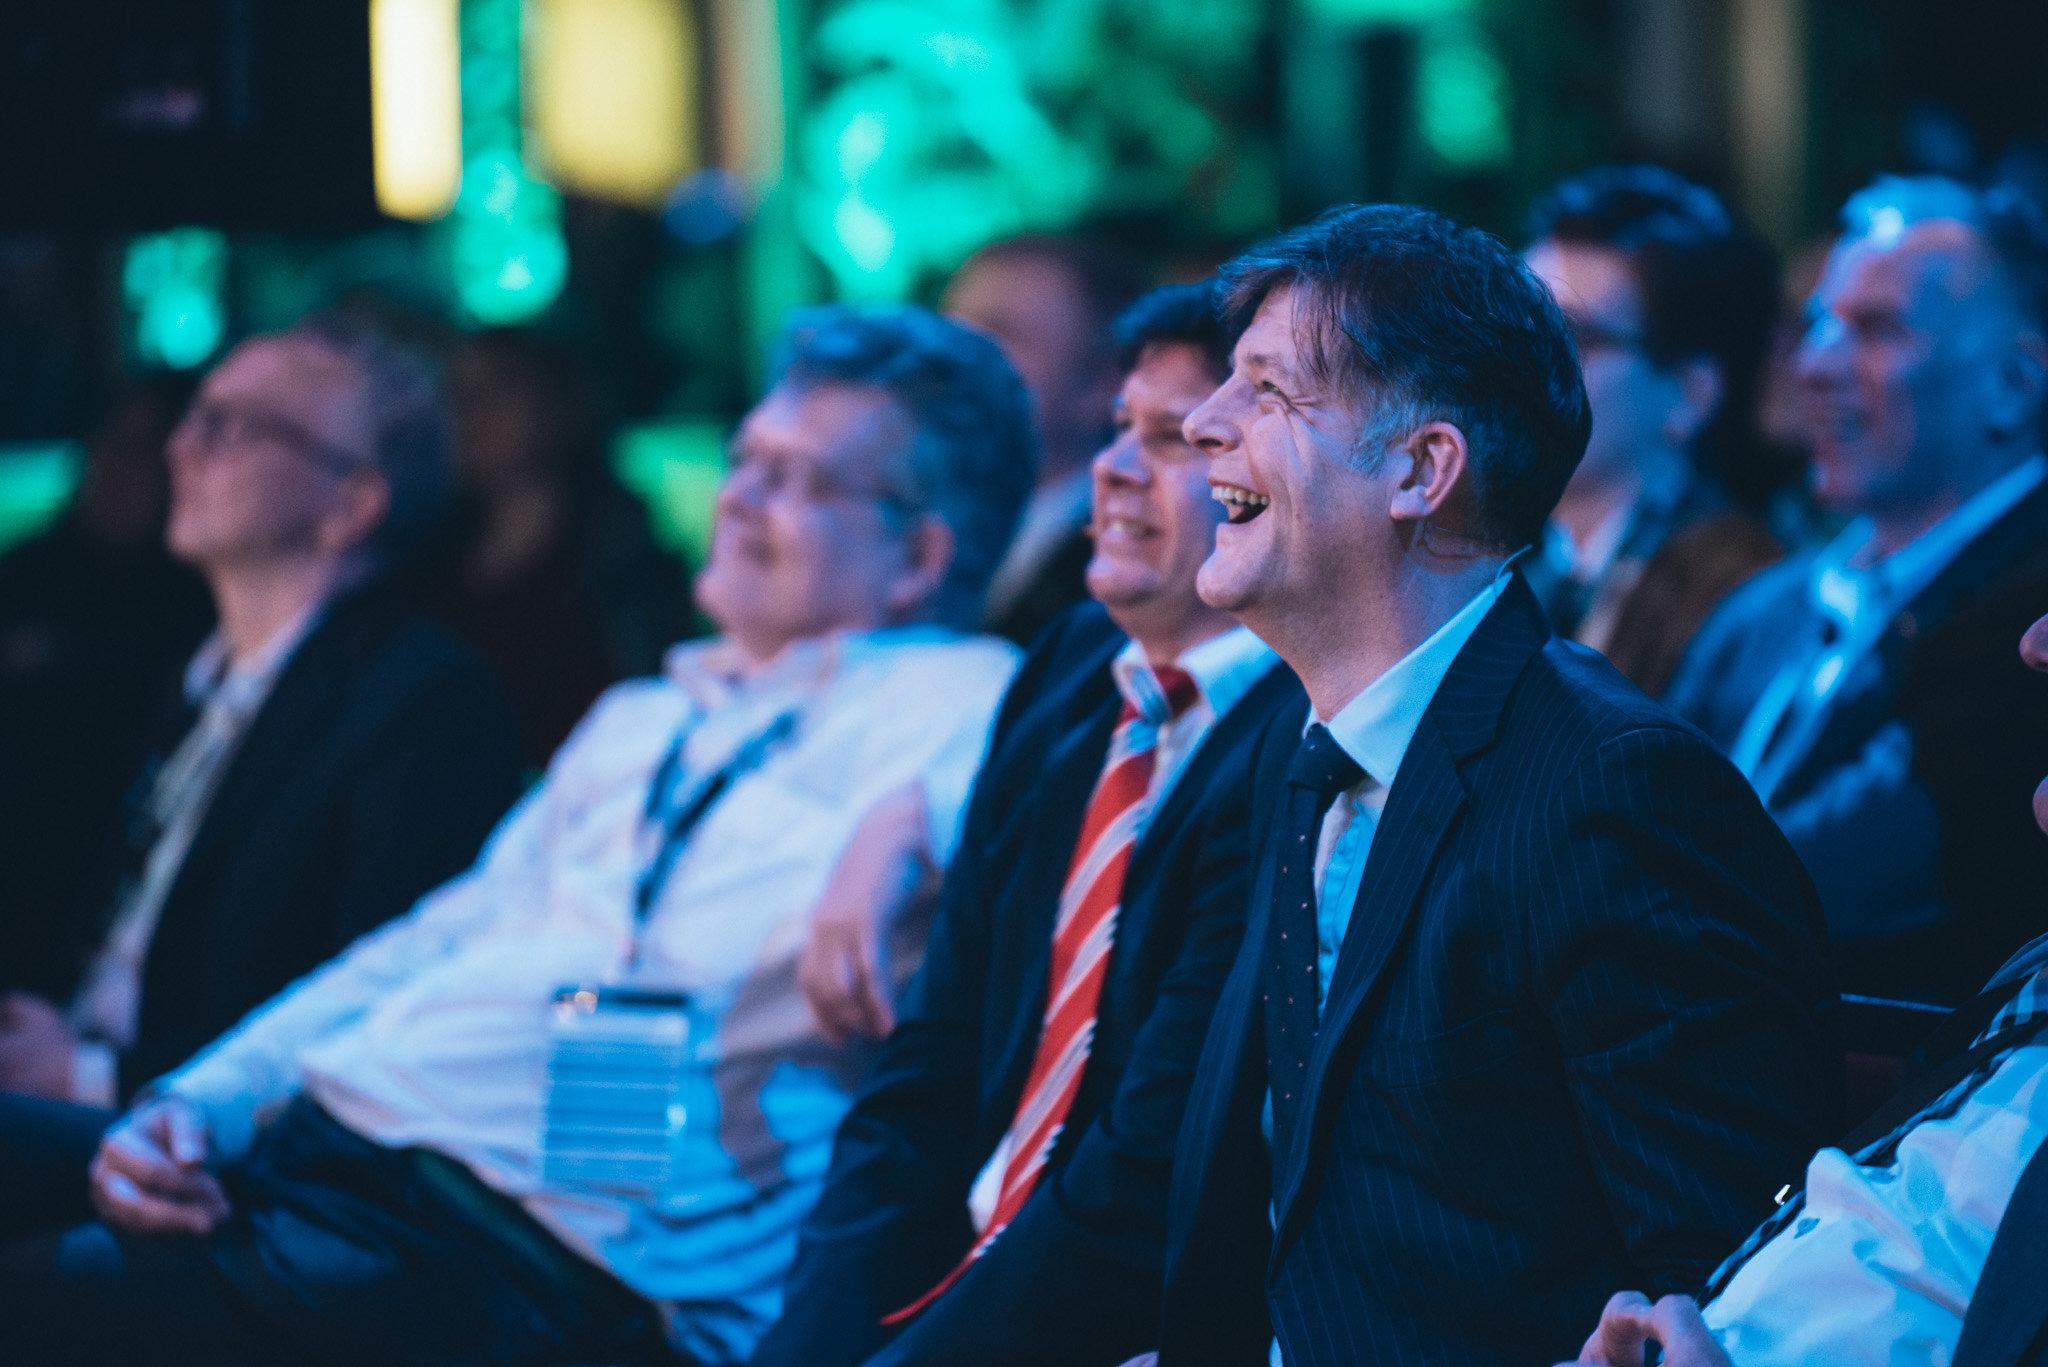 3DX_forum_event_highlights_rotterdam_presentations-91.jpg